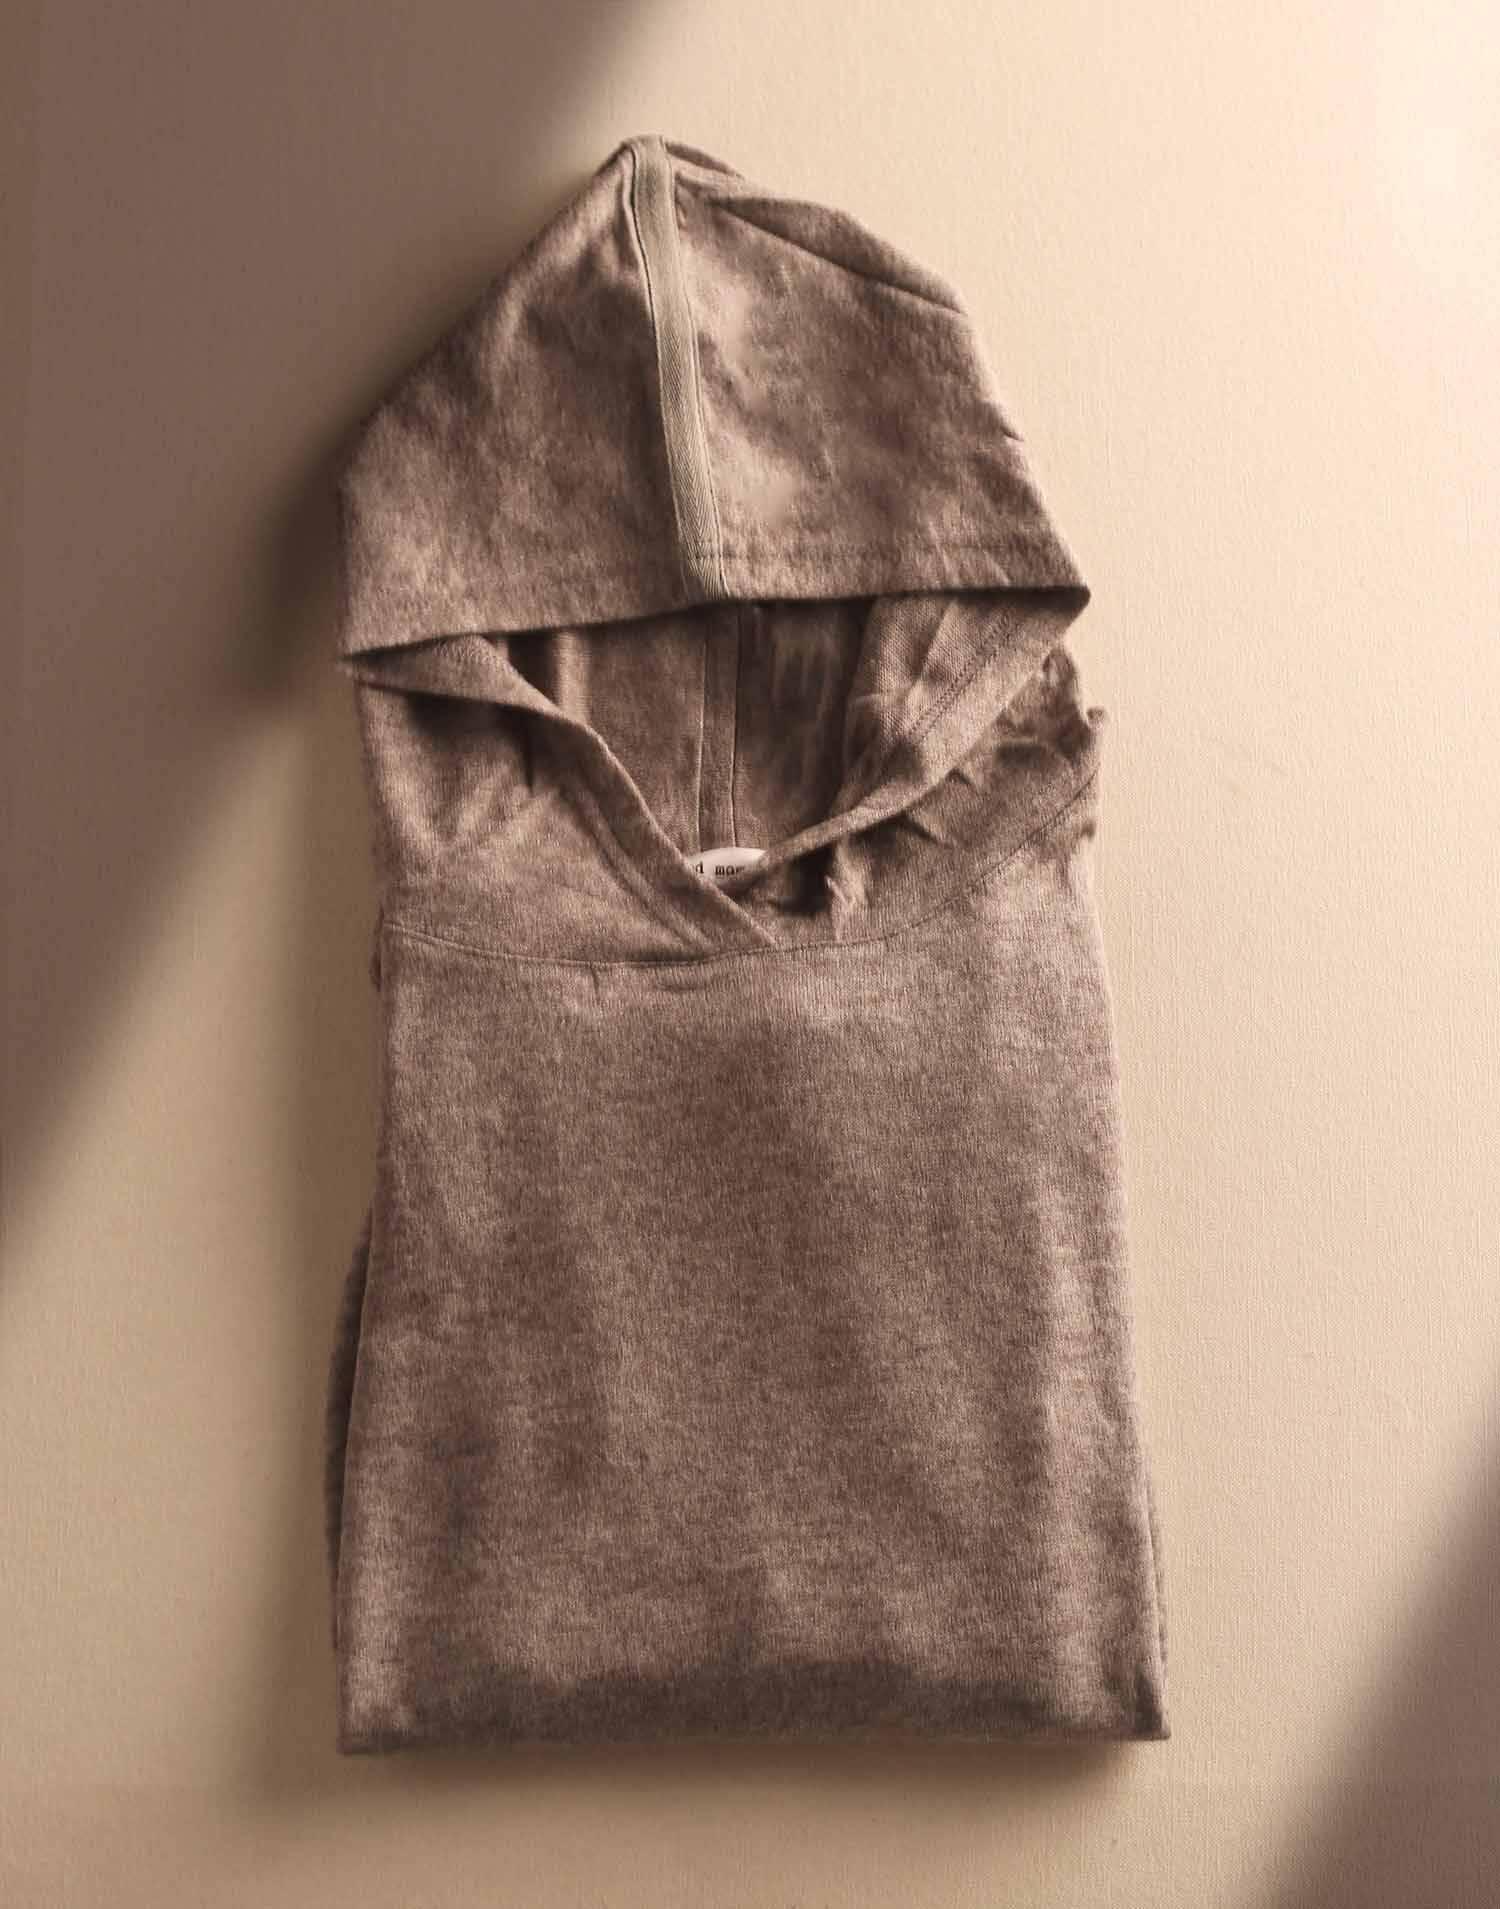 Sudadera con capucha tejido suave unisex